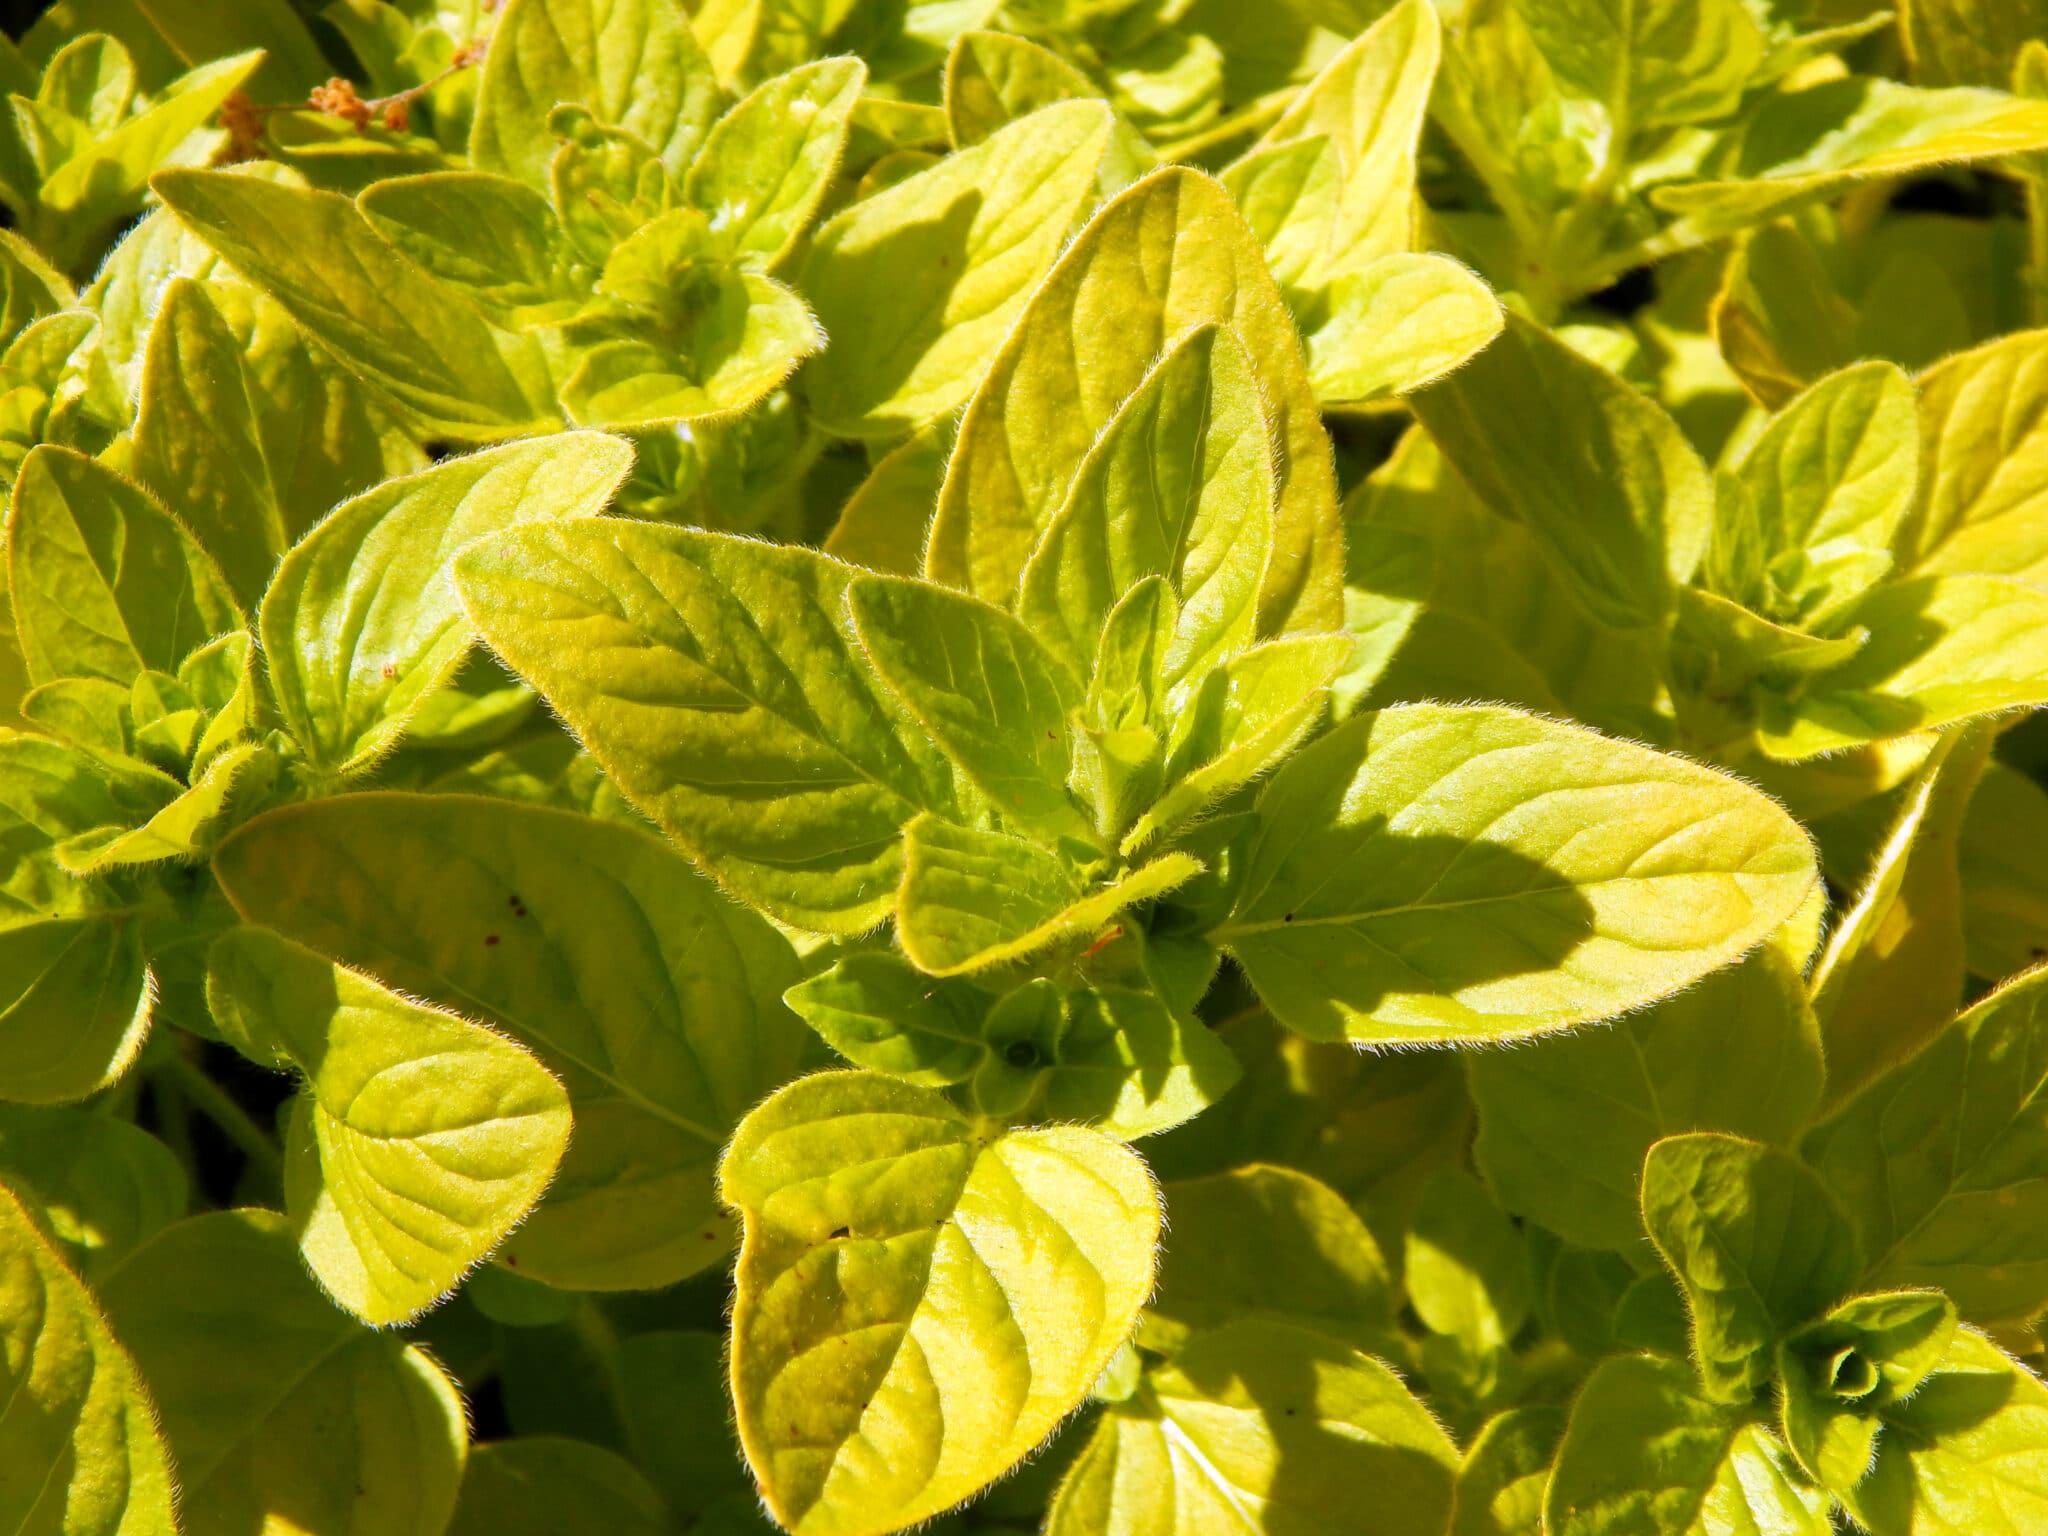 Soft yellow golden oregano growing outside.